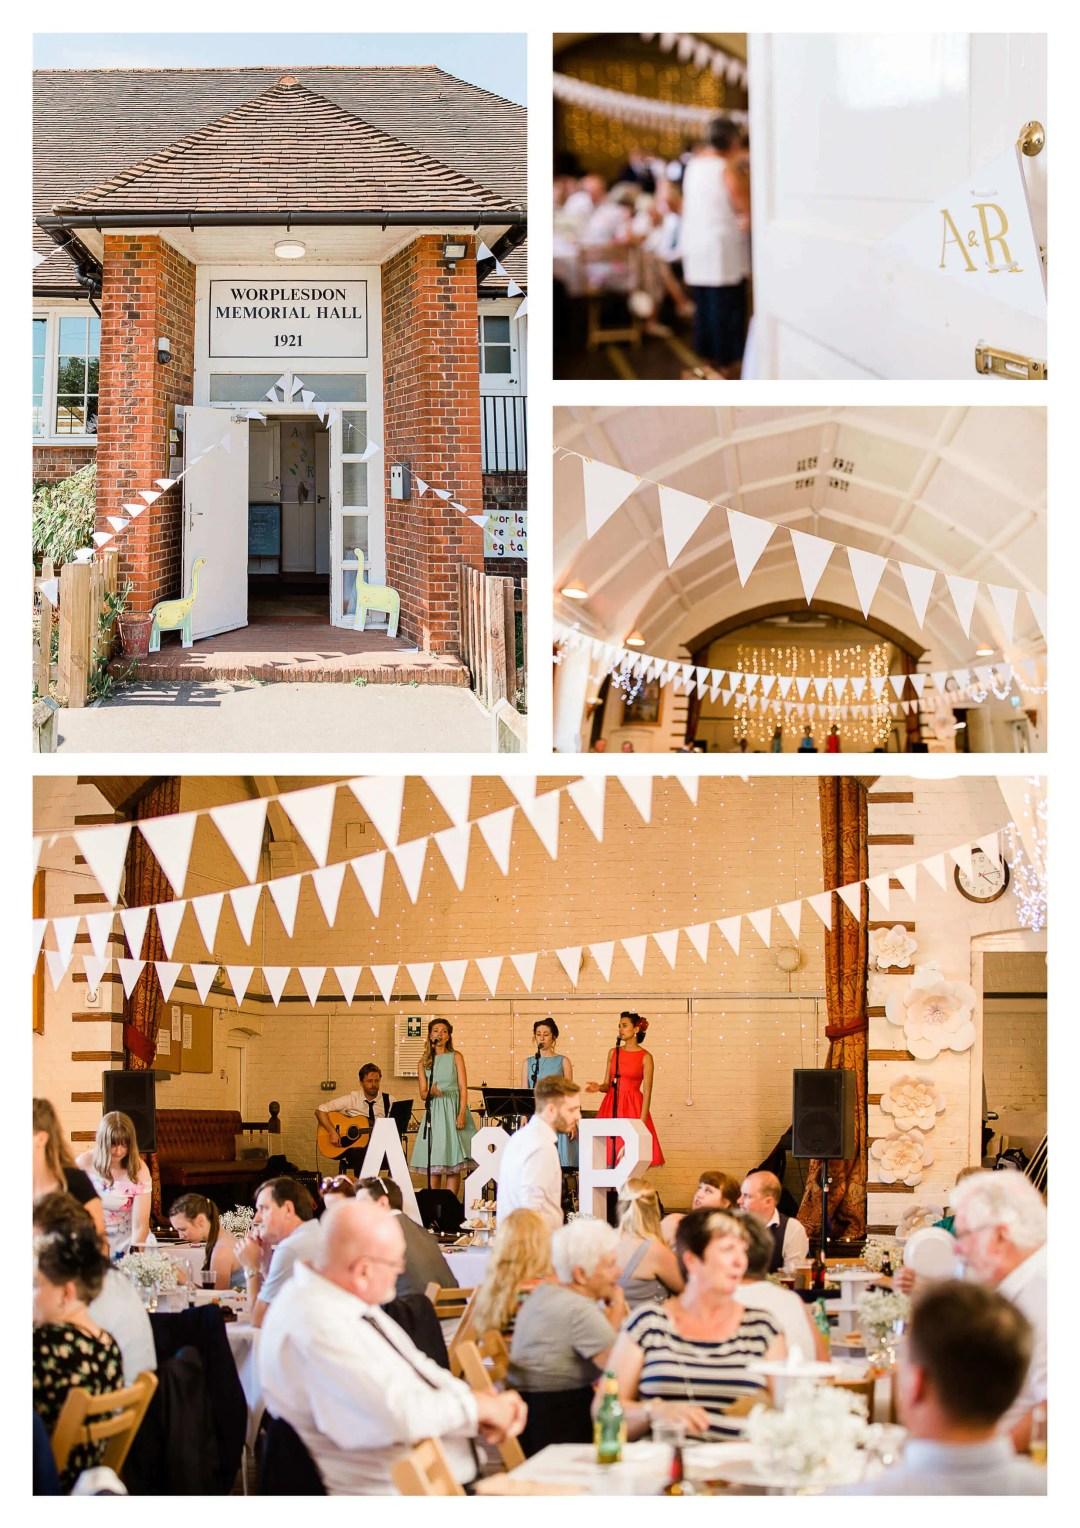 Guildford town hall wedding venue decor | Surrey Wedding Photographer